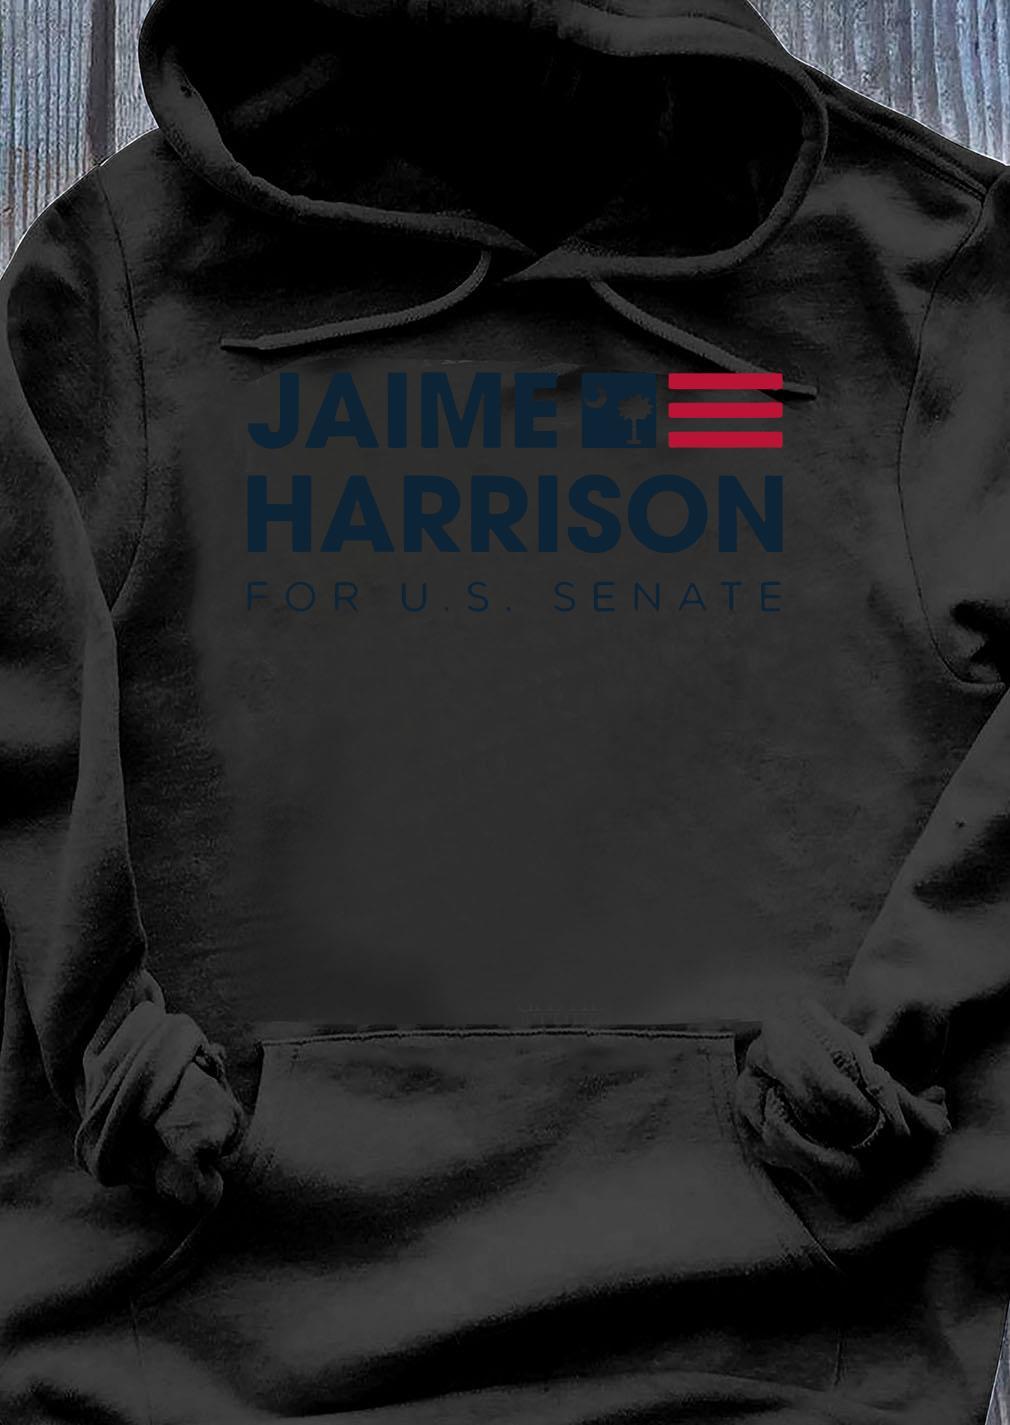 Jaime Harrison For Us Senate Uniex Shirt Hoodie